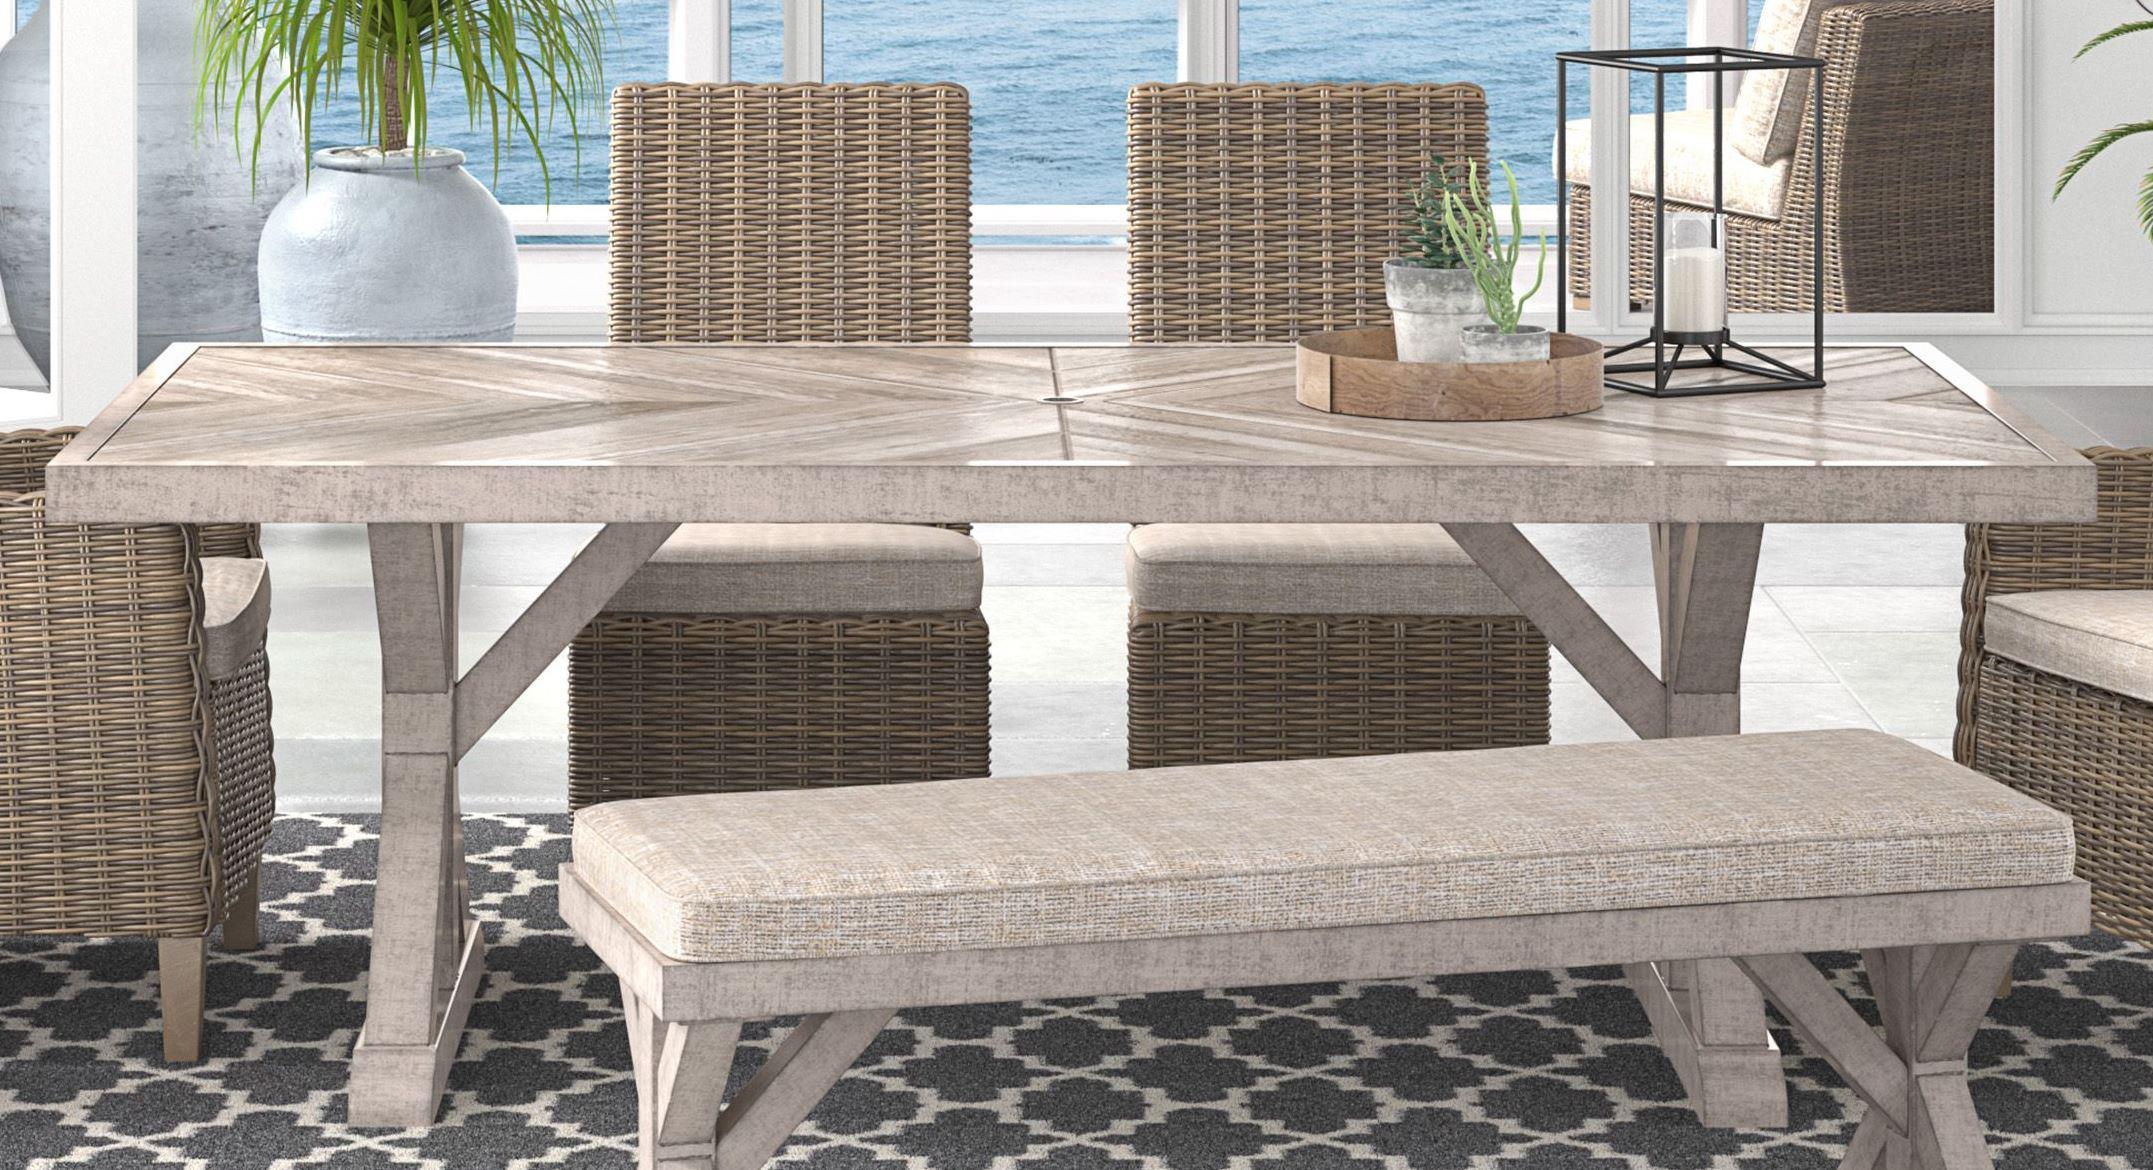 Signature Design by Ashley Beachcroft Beige Rectangular ... on Beachcroft Beige Outdoor Living Room Set id=54318